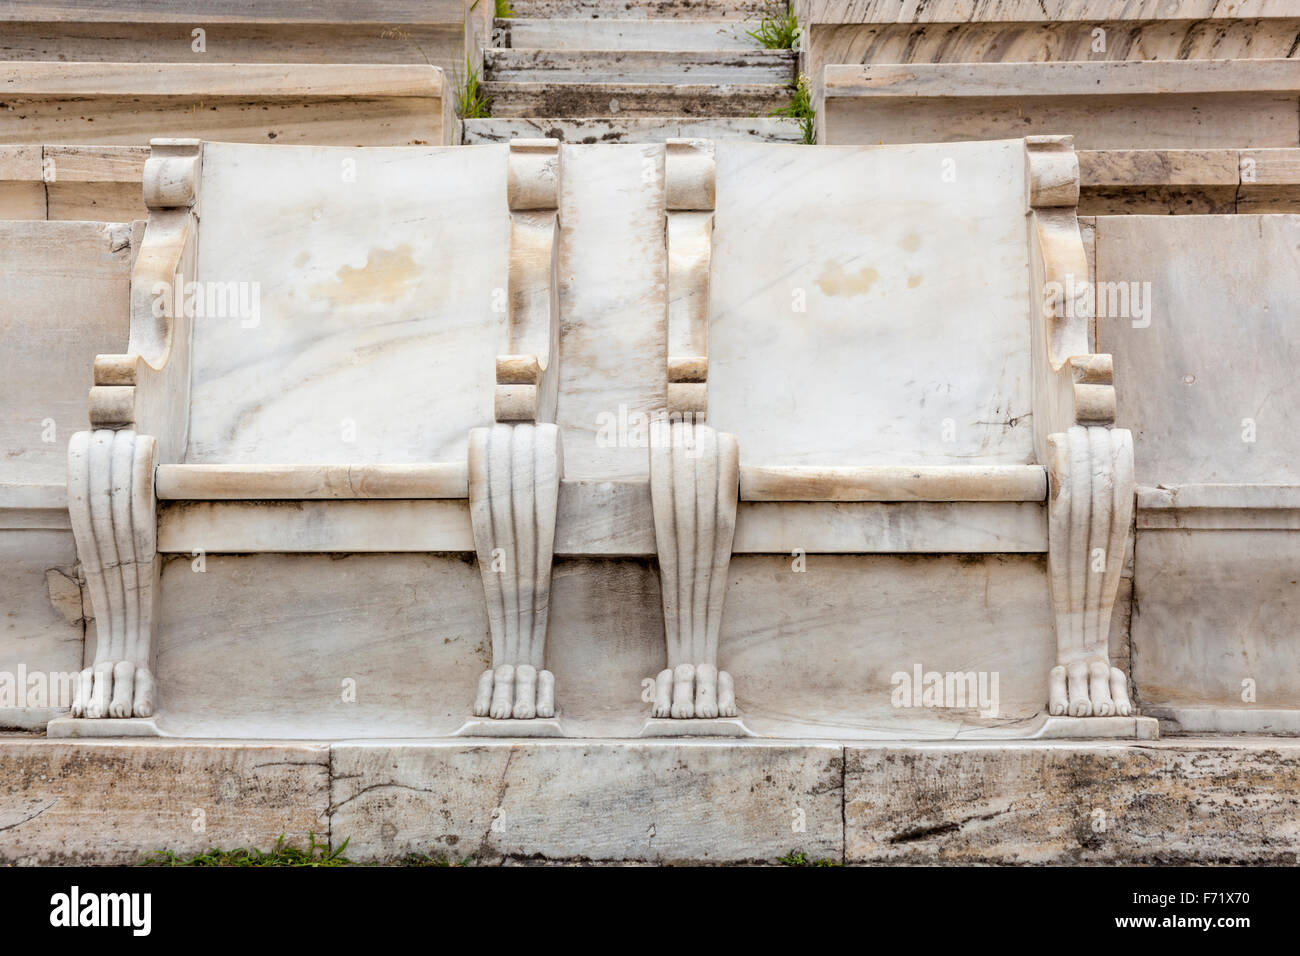 Royal boxes used in 1896, Panathenaic Stadium, original modern day Olympic Stadium, Athens, Greece Stock Photo